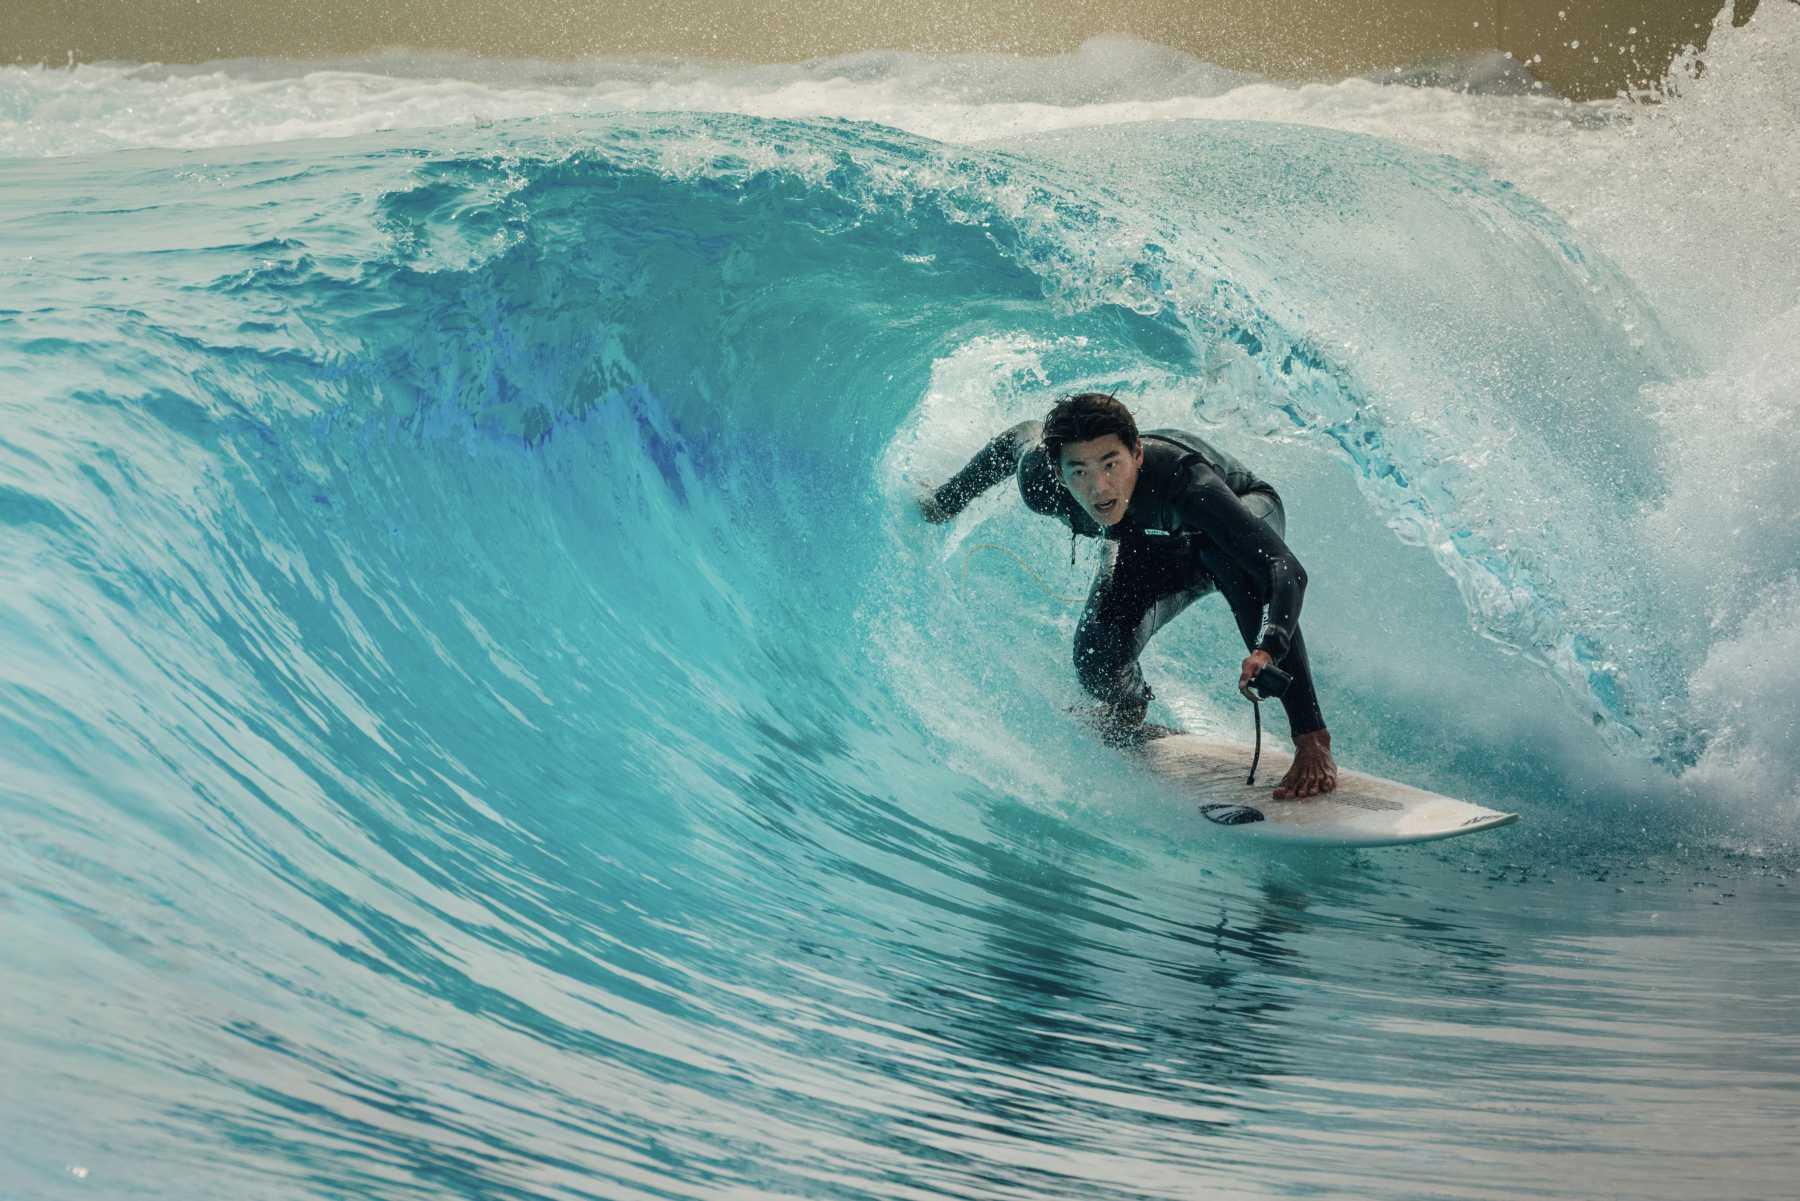 surf30 wavegarden cove corea Wavegarden Cove WavePark Jaeyoung Choi